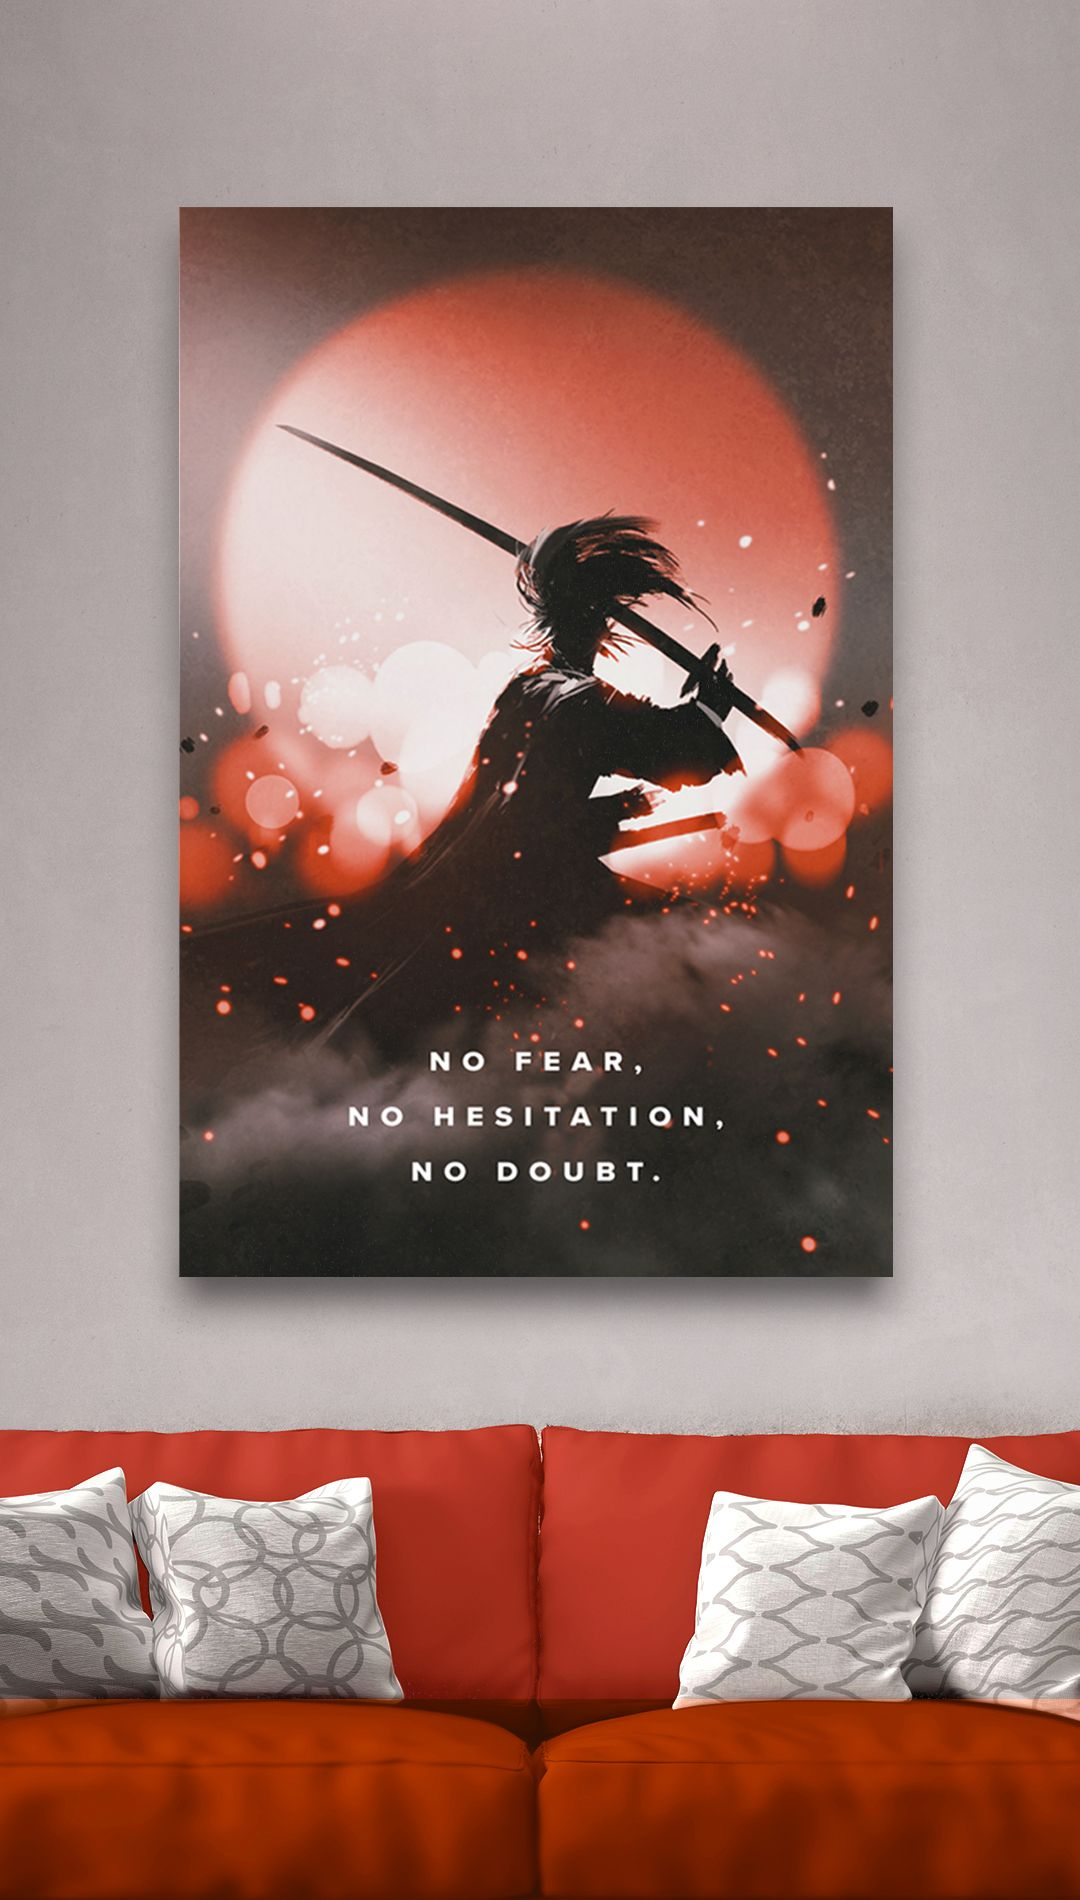 Motiversity Best Motivational Canvas Wall Art in 2020